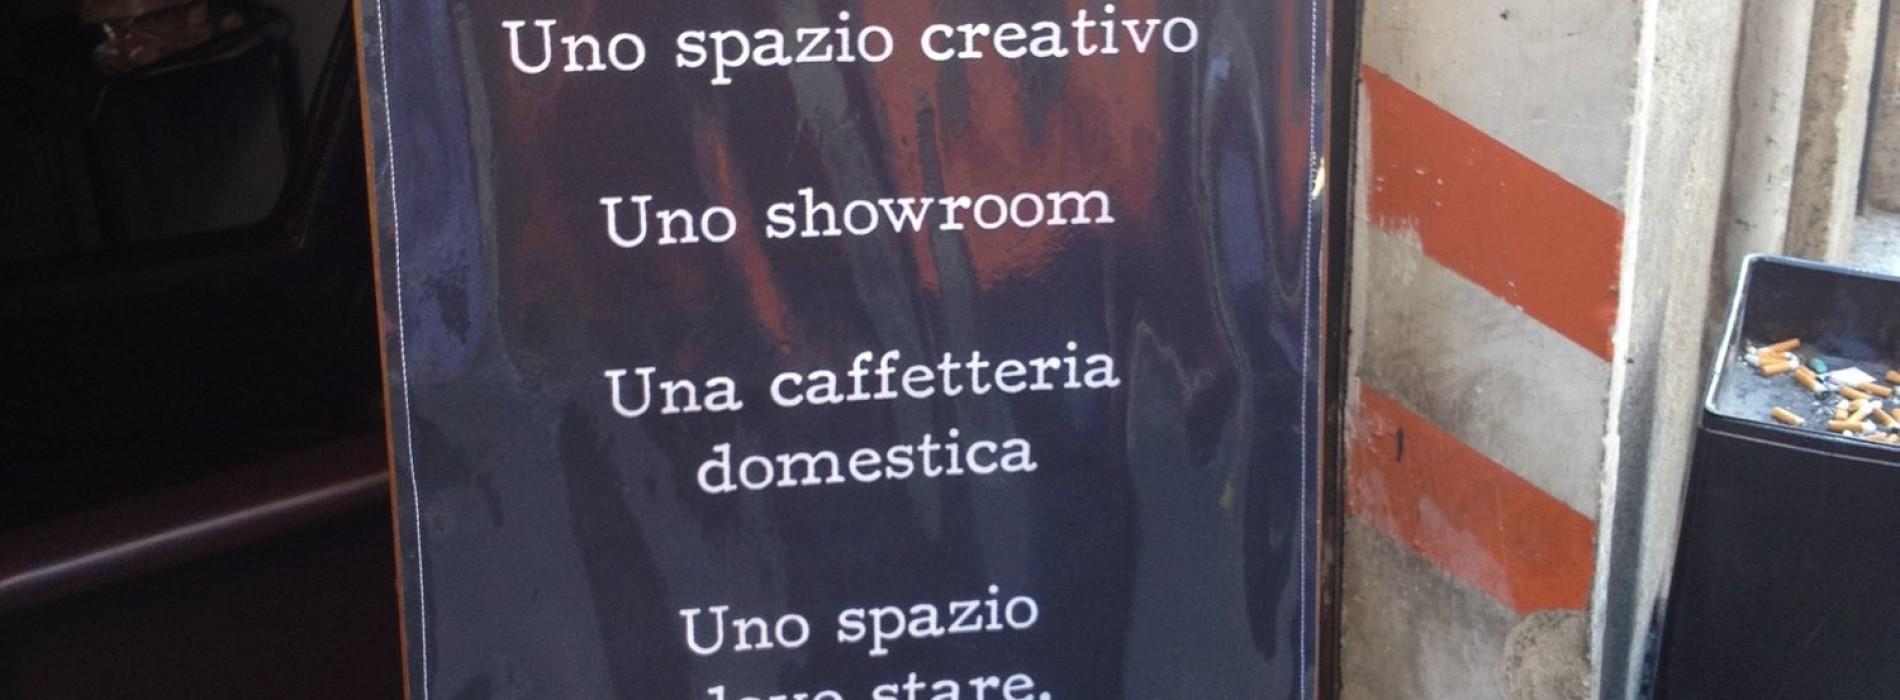 2periodico, un gran bel caffè a Monti